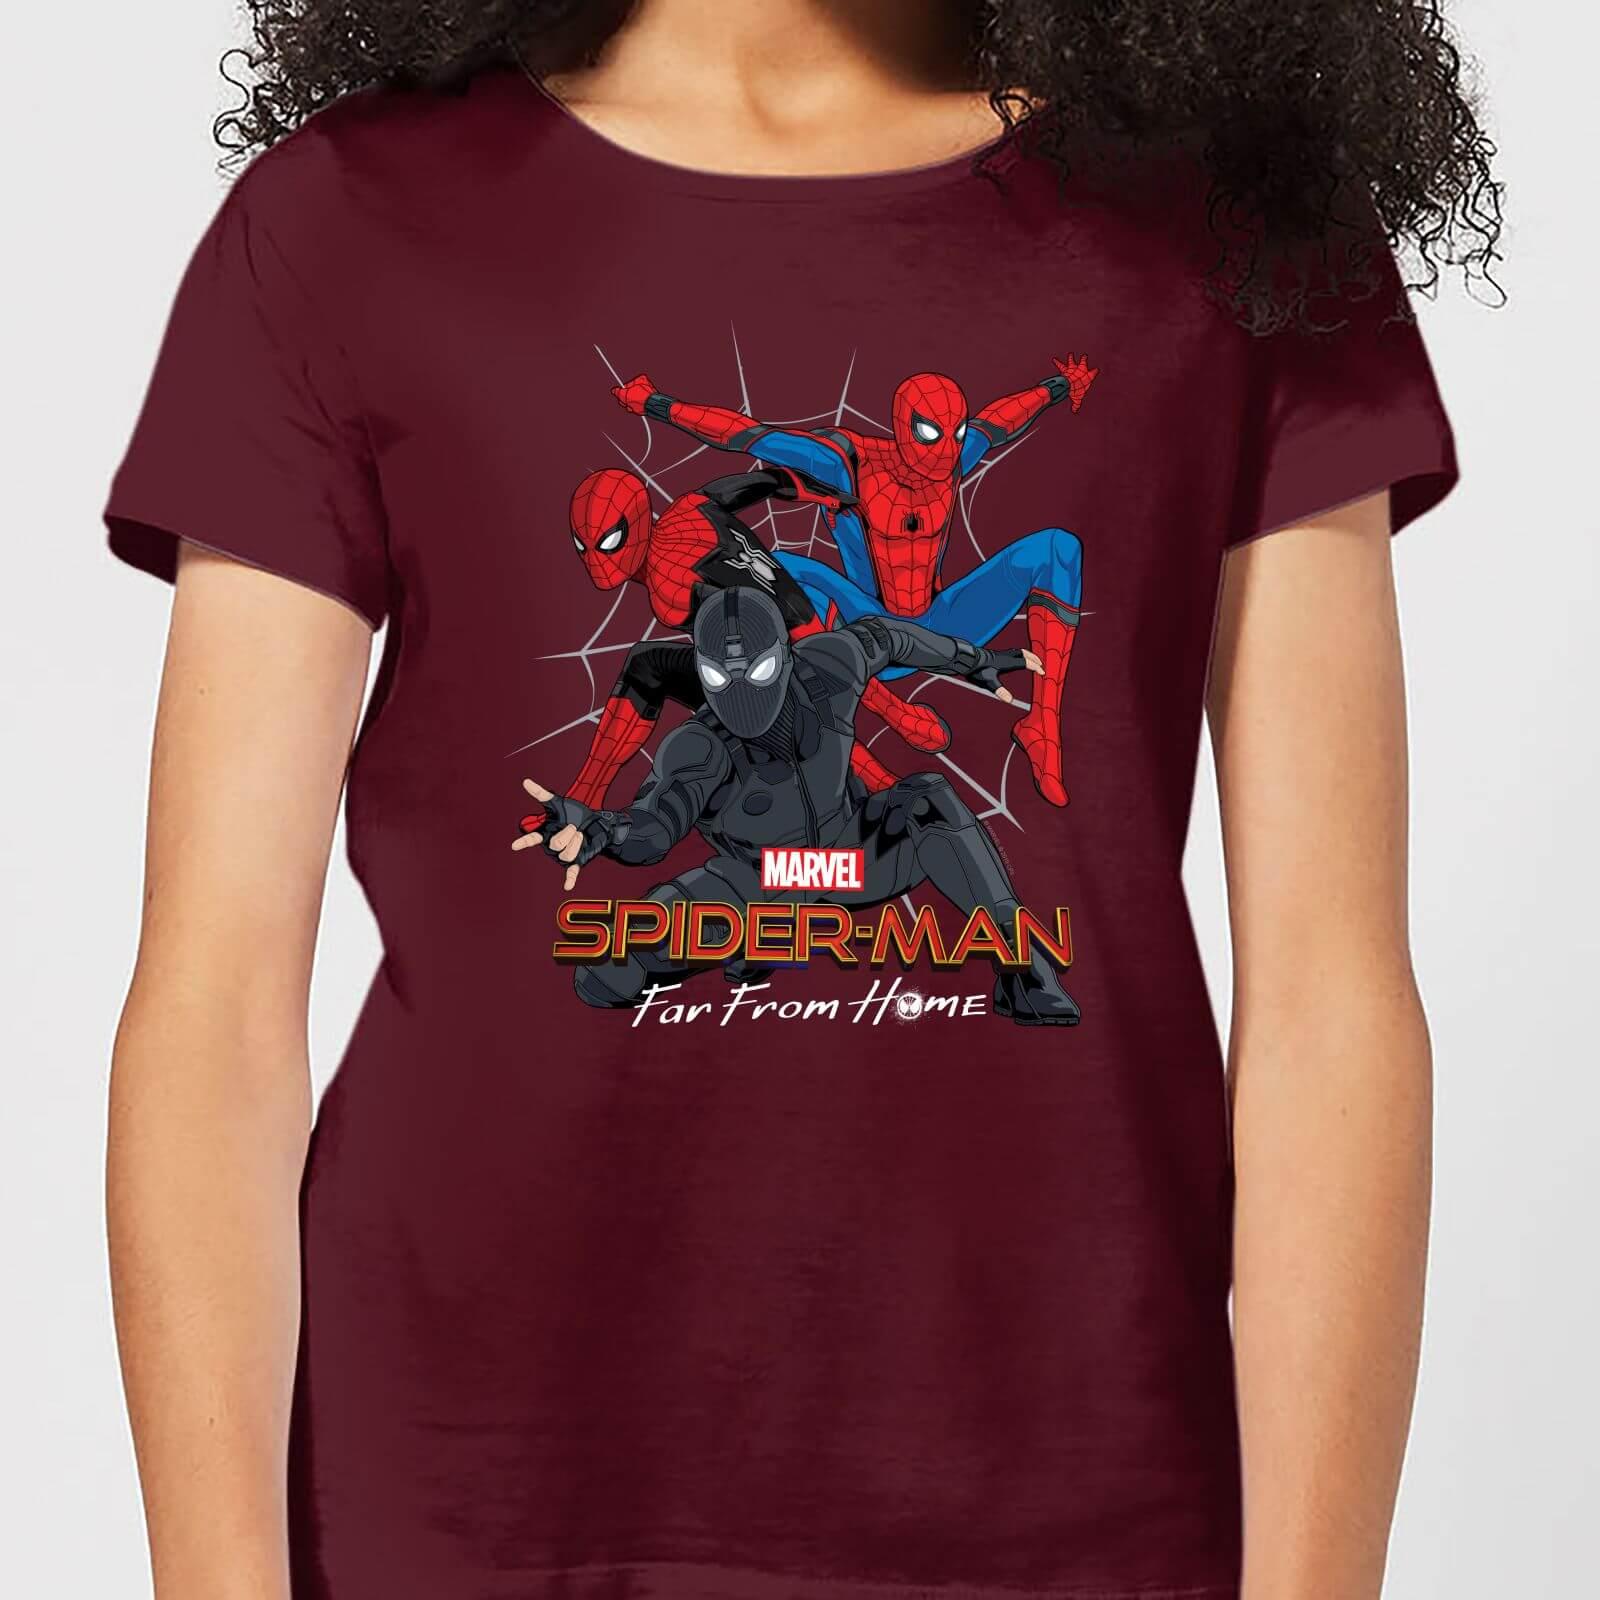 76a286e12 Spider-Man Far From Home Multi Costume Women's T-Shirt - Burgundy Clothing  | Zavvi